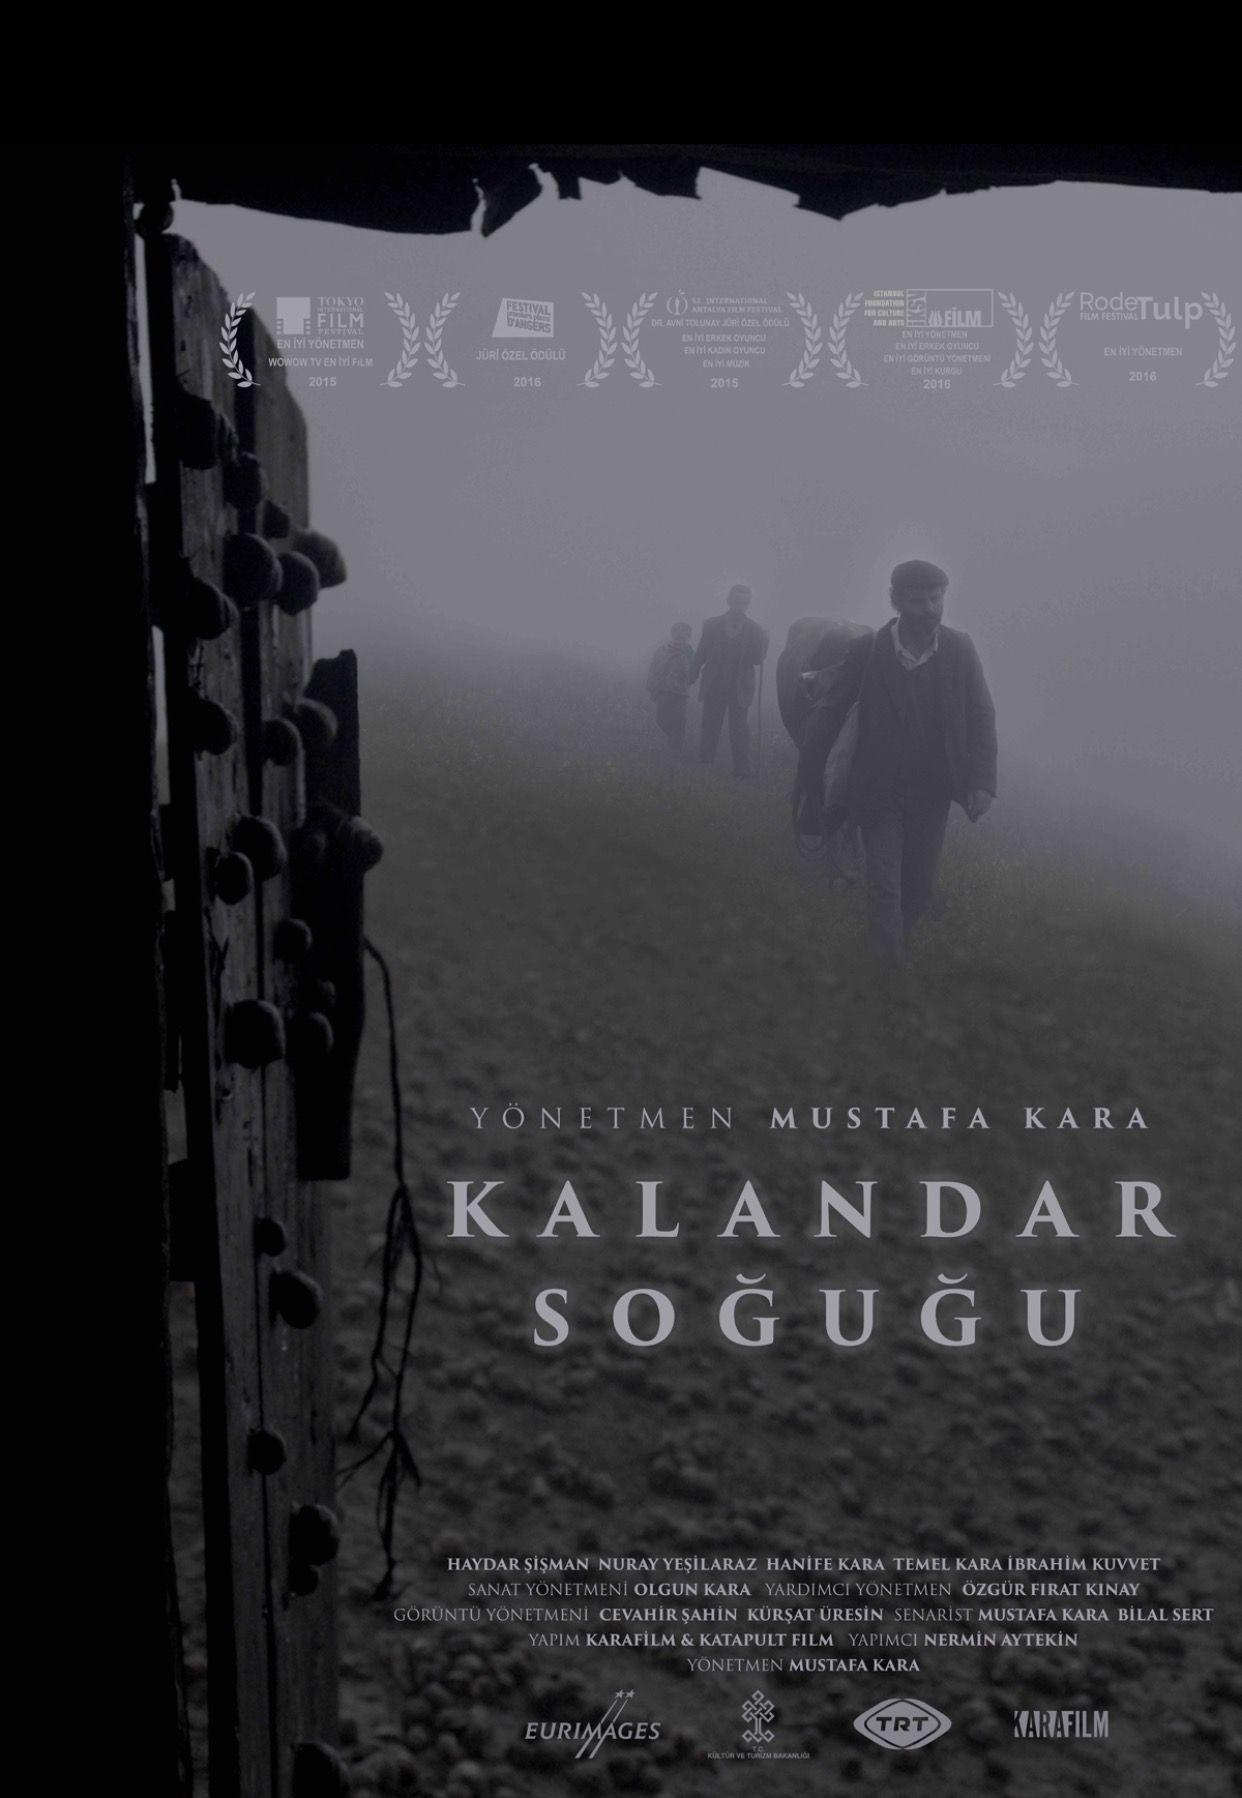 Kalandar Sogugu Film Cinema Art Movie Posters